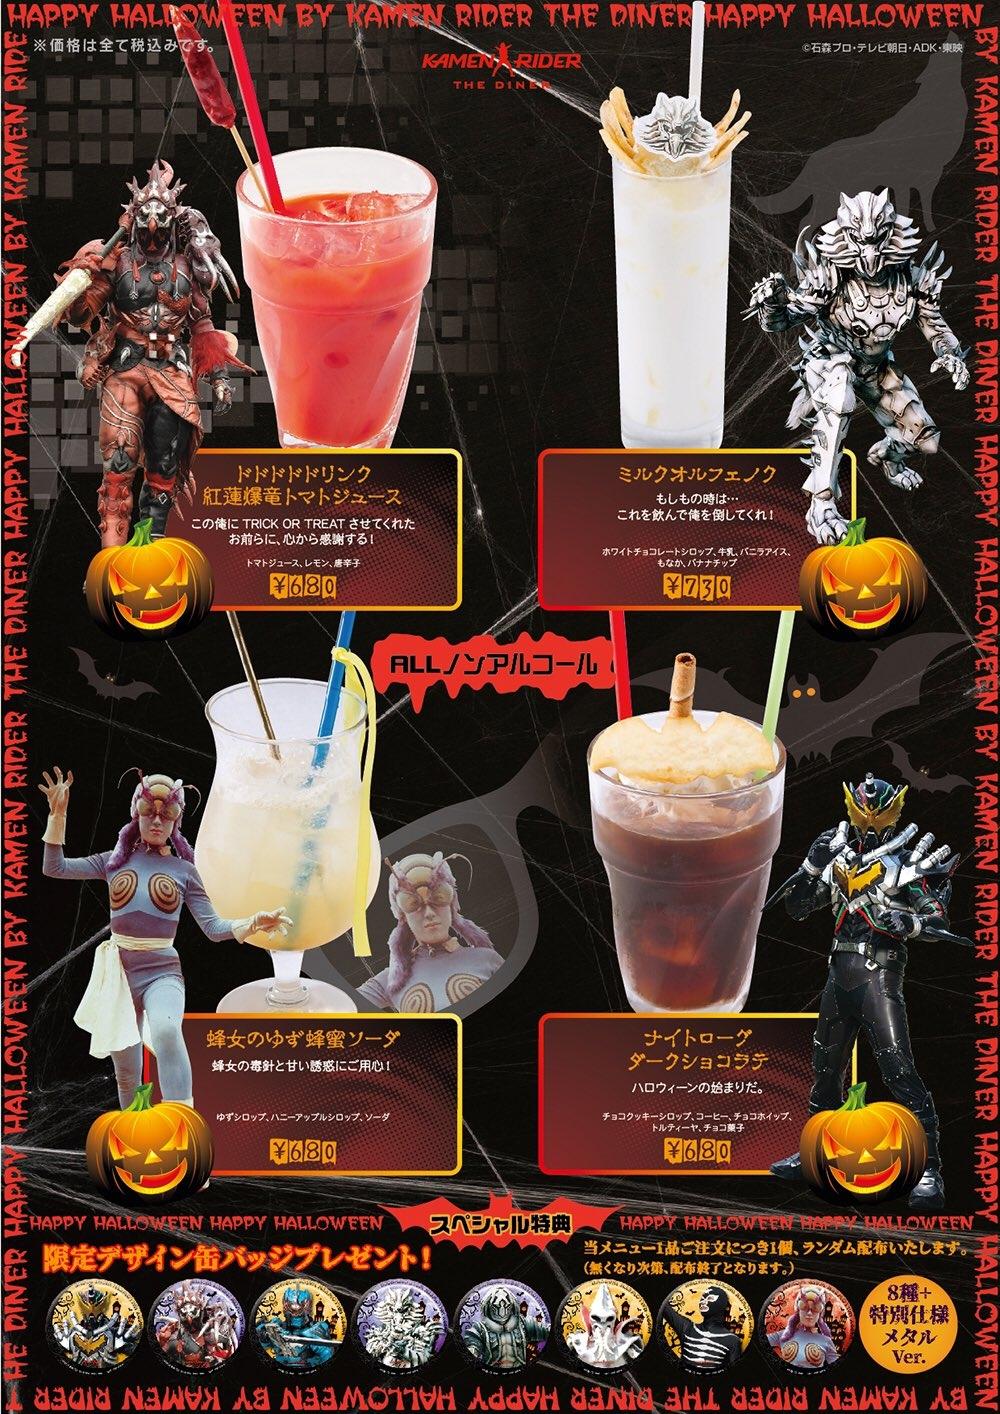 kamen rider the diner reveals their halloween menu daisuki toku